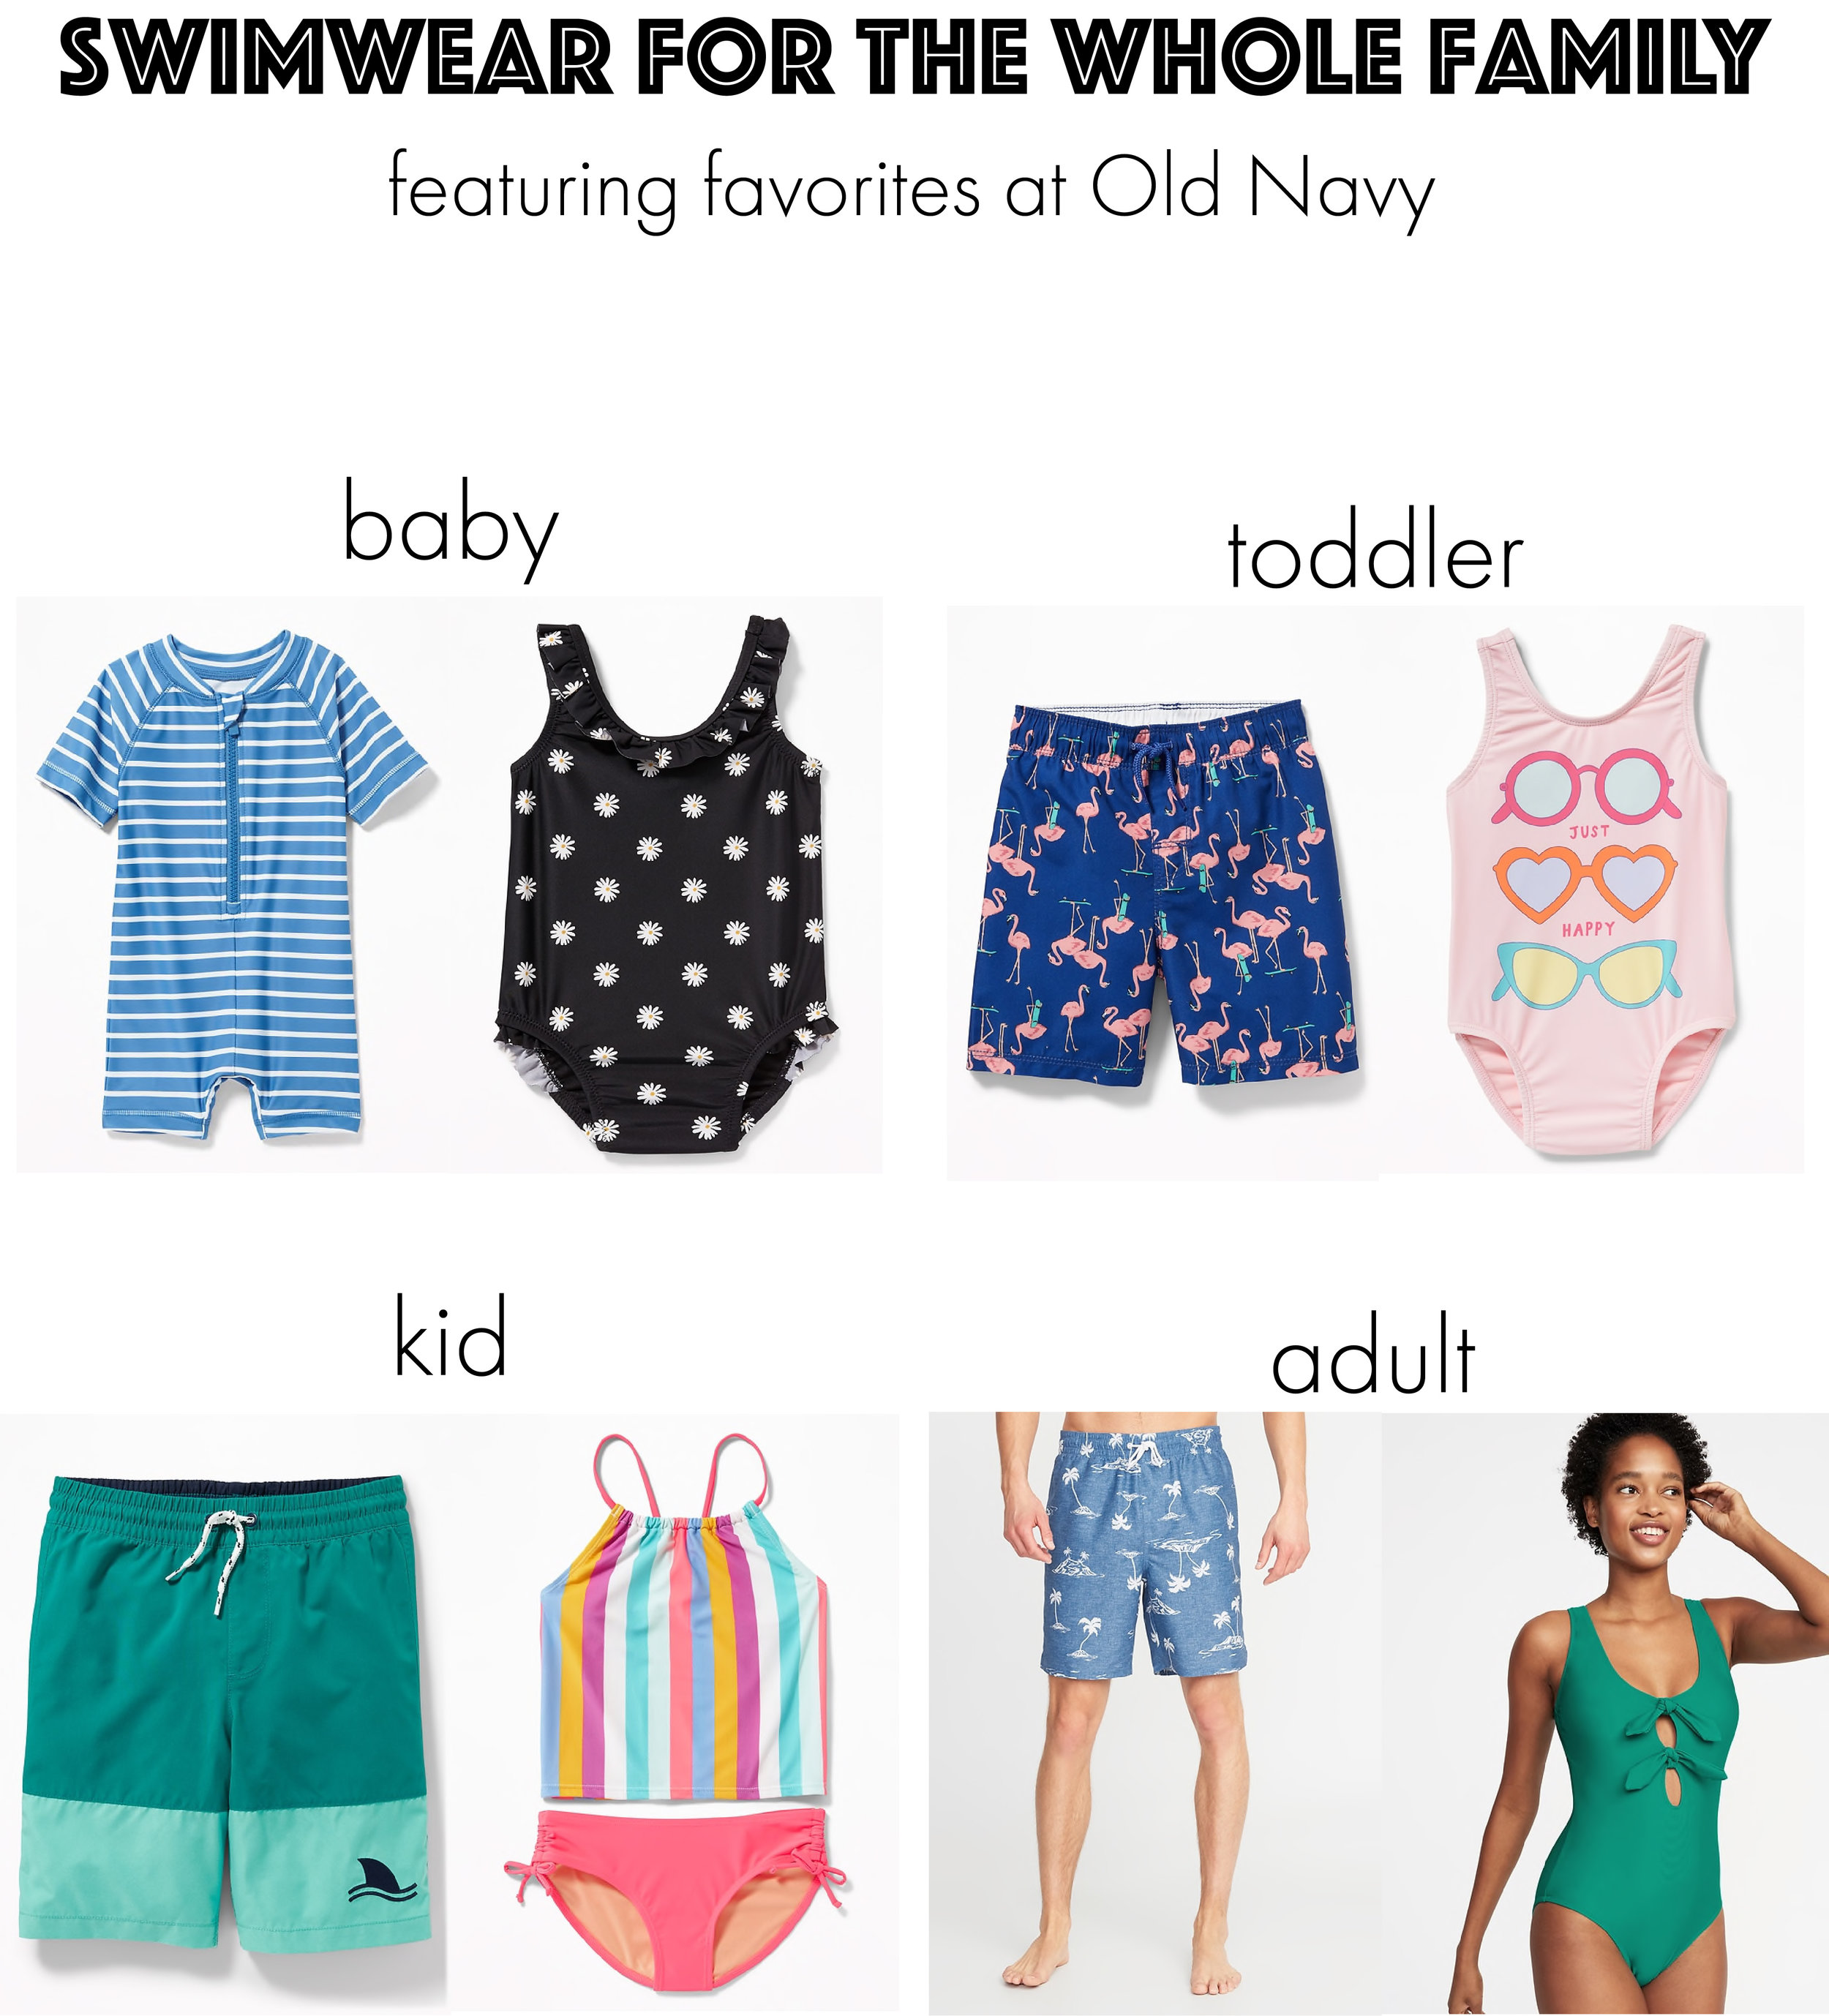 old-navy-swim-wear